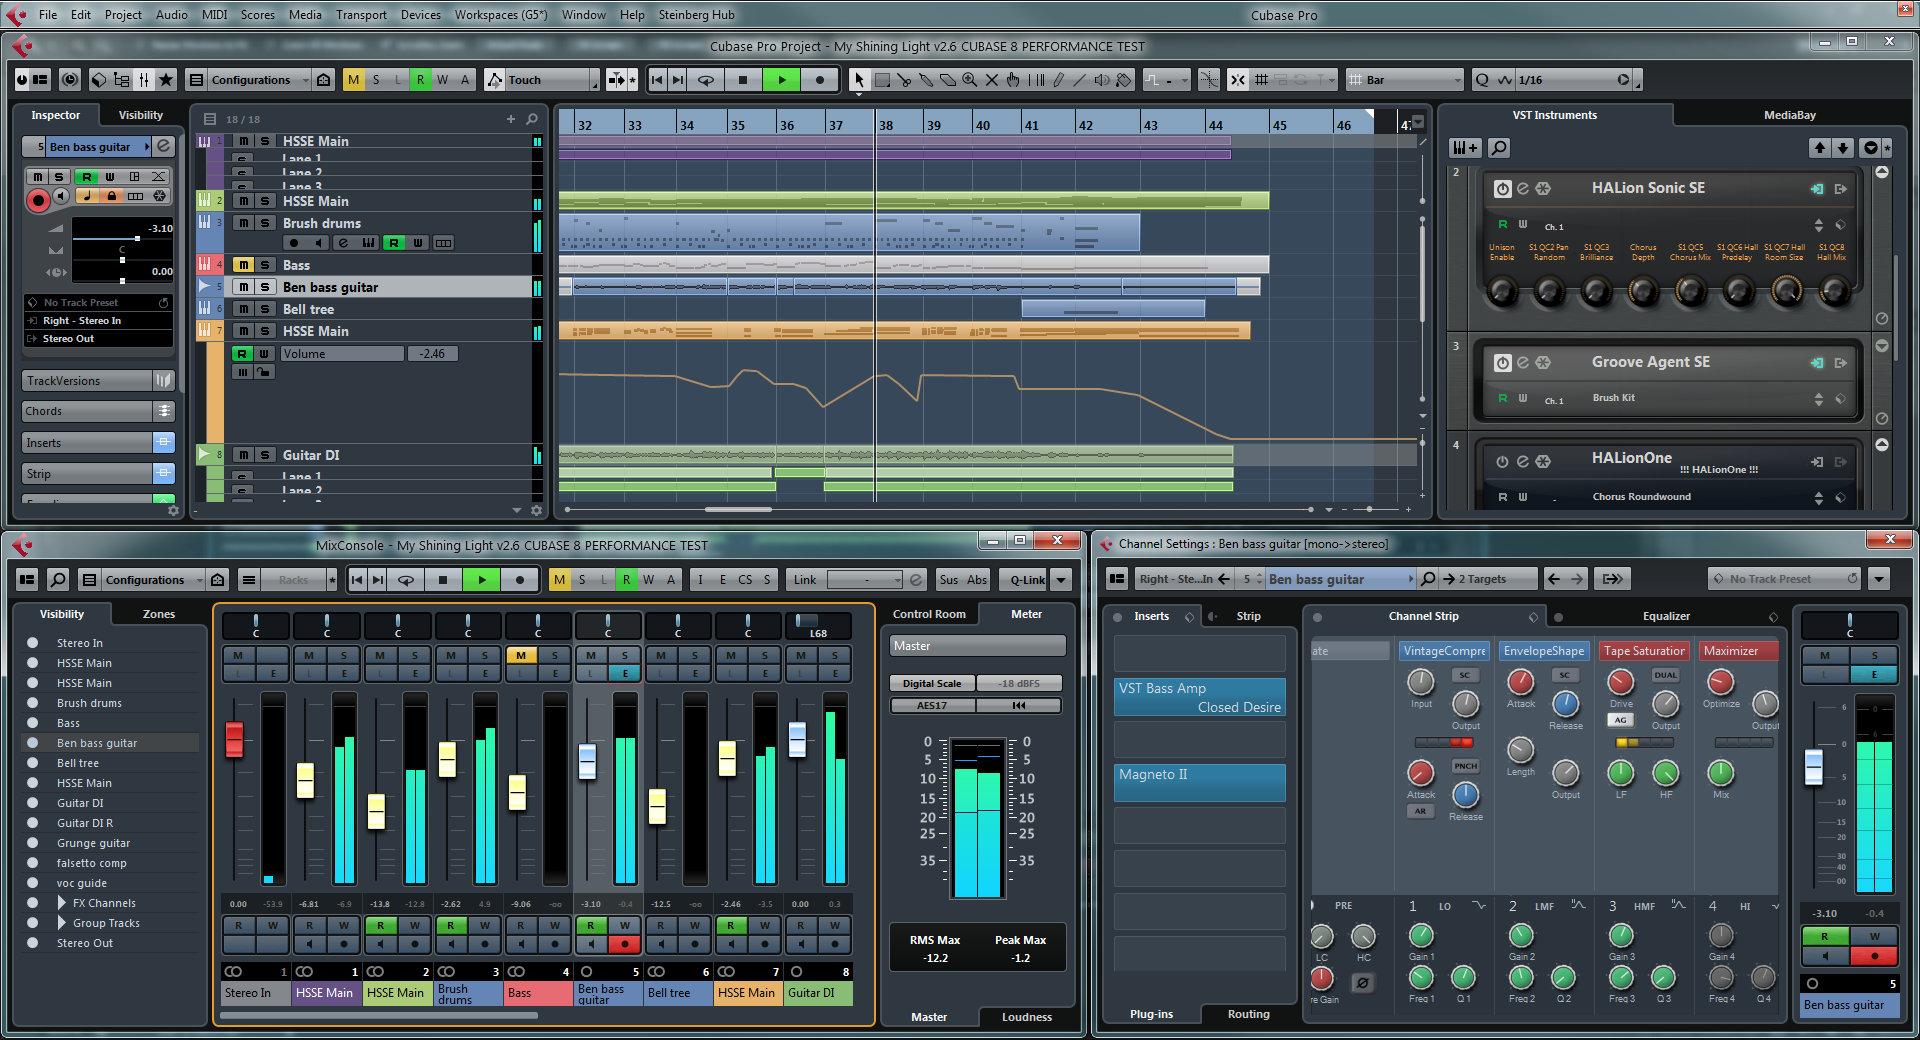 cubase studio 4 free download full version